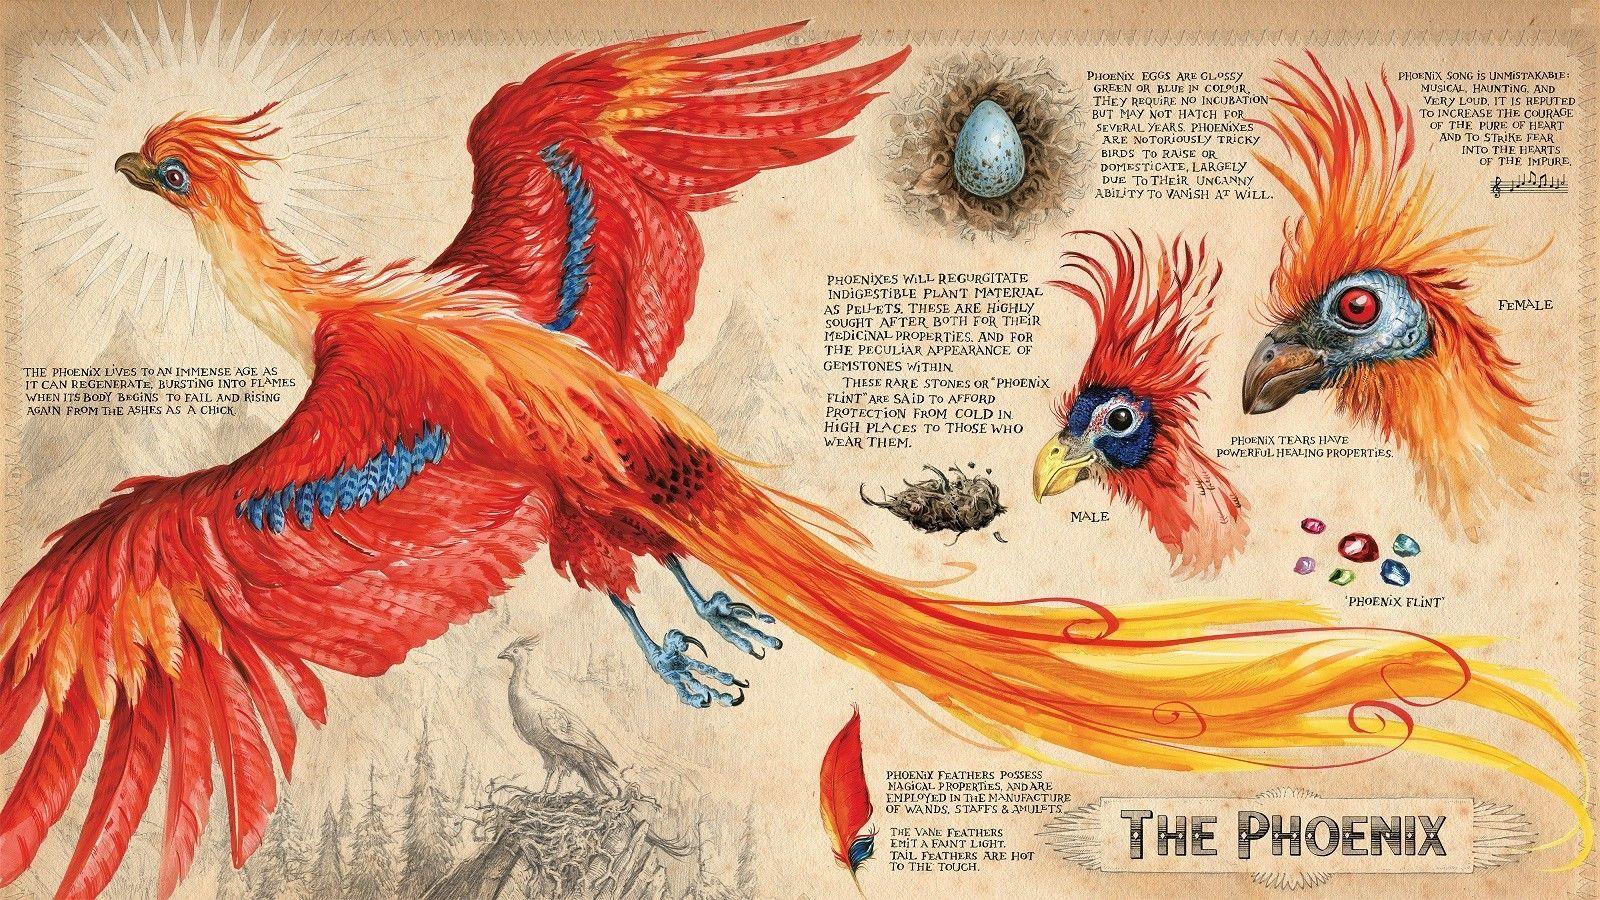 2021 The Phoenix Bird Art Silk Poster 20x30 24x36 24x43 From Chuy8988 10 93 Dhgate Com